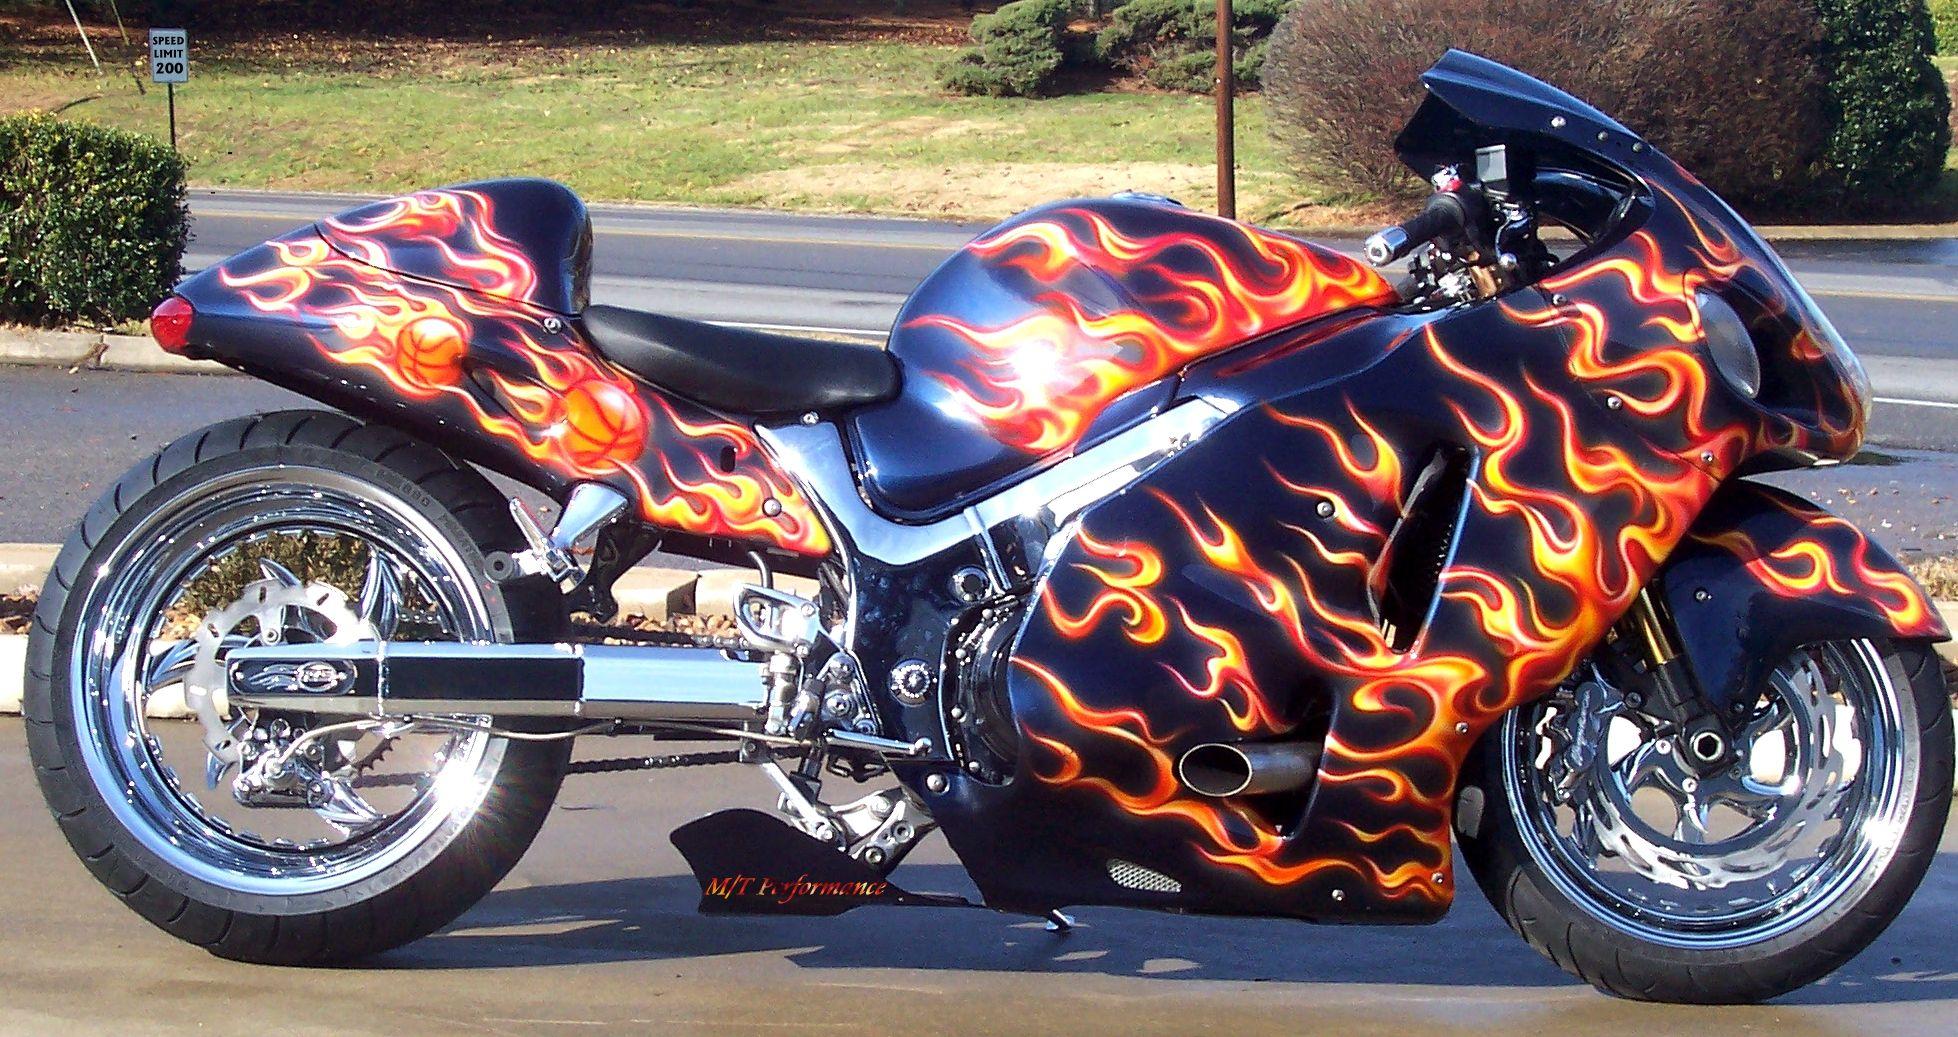 So fast it caught fire lol!